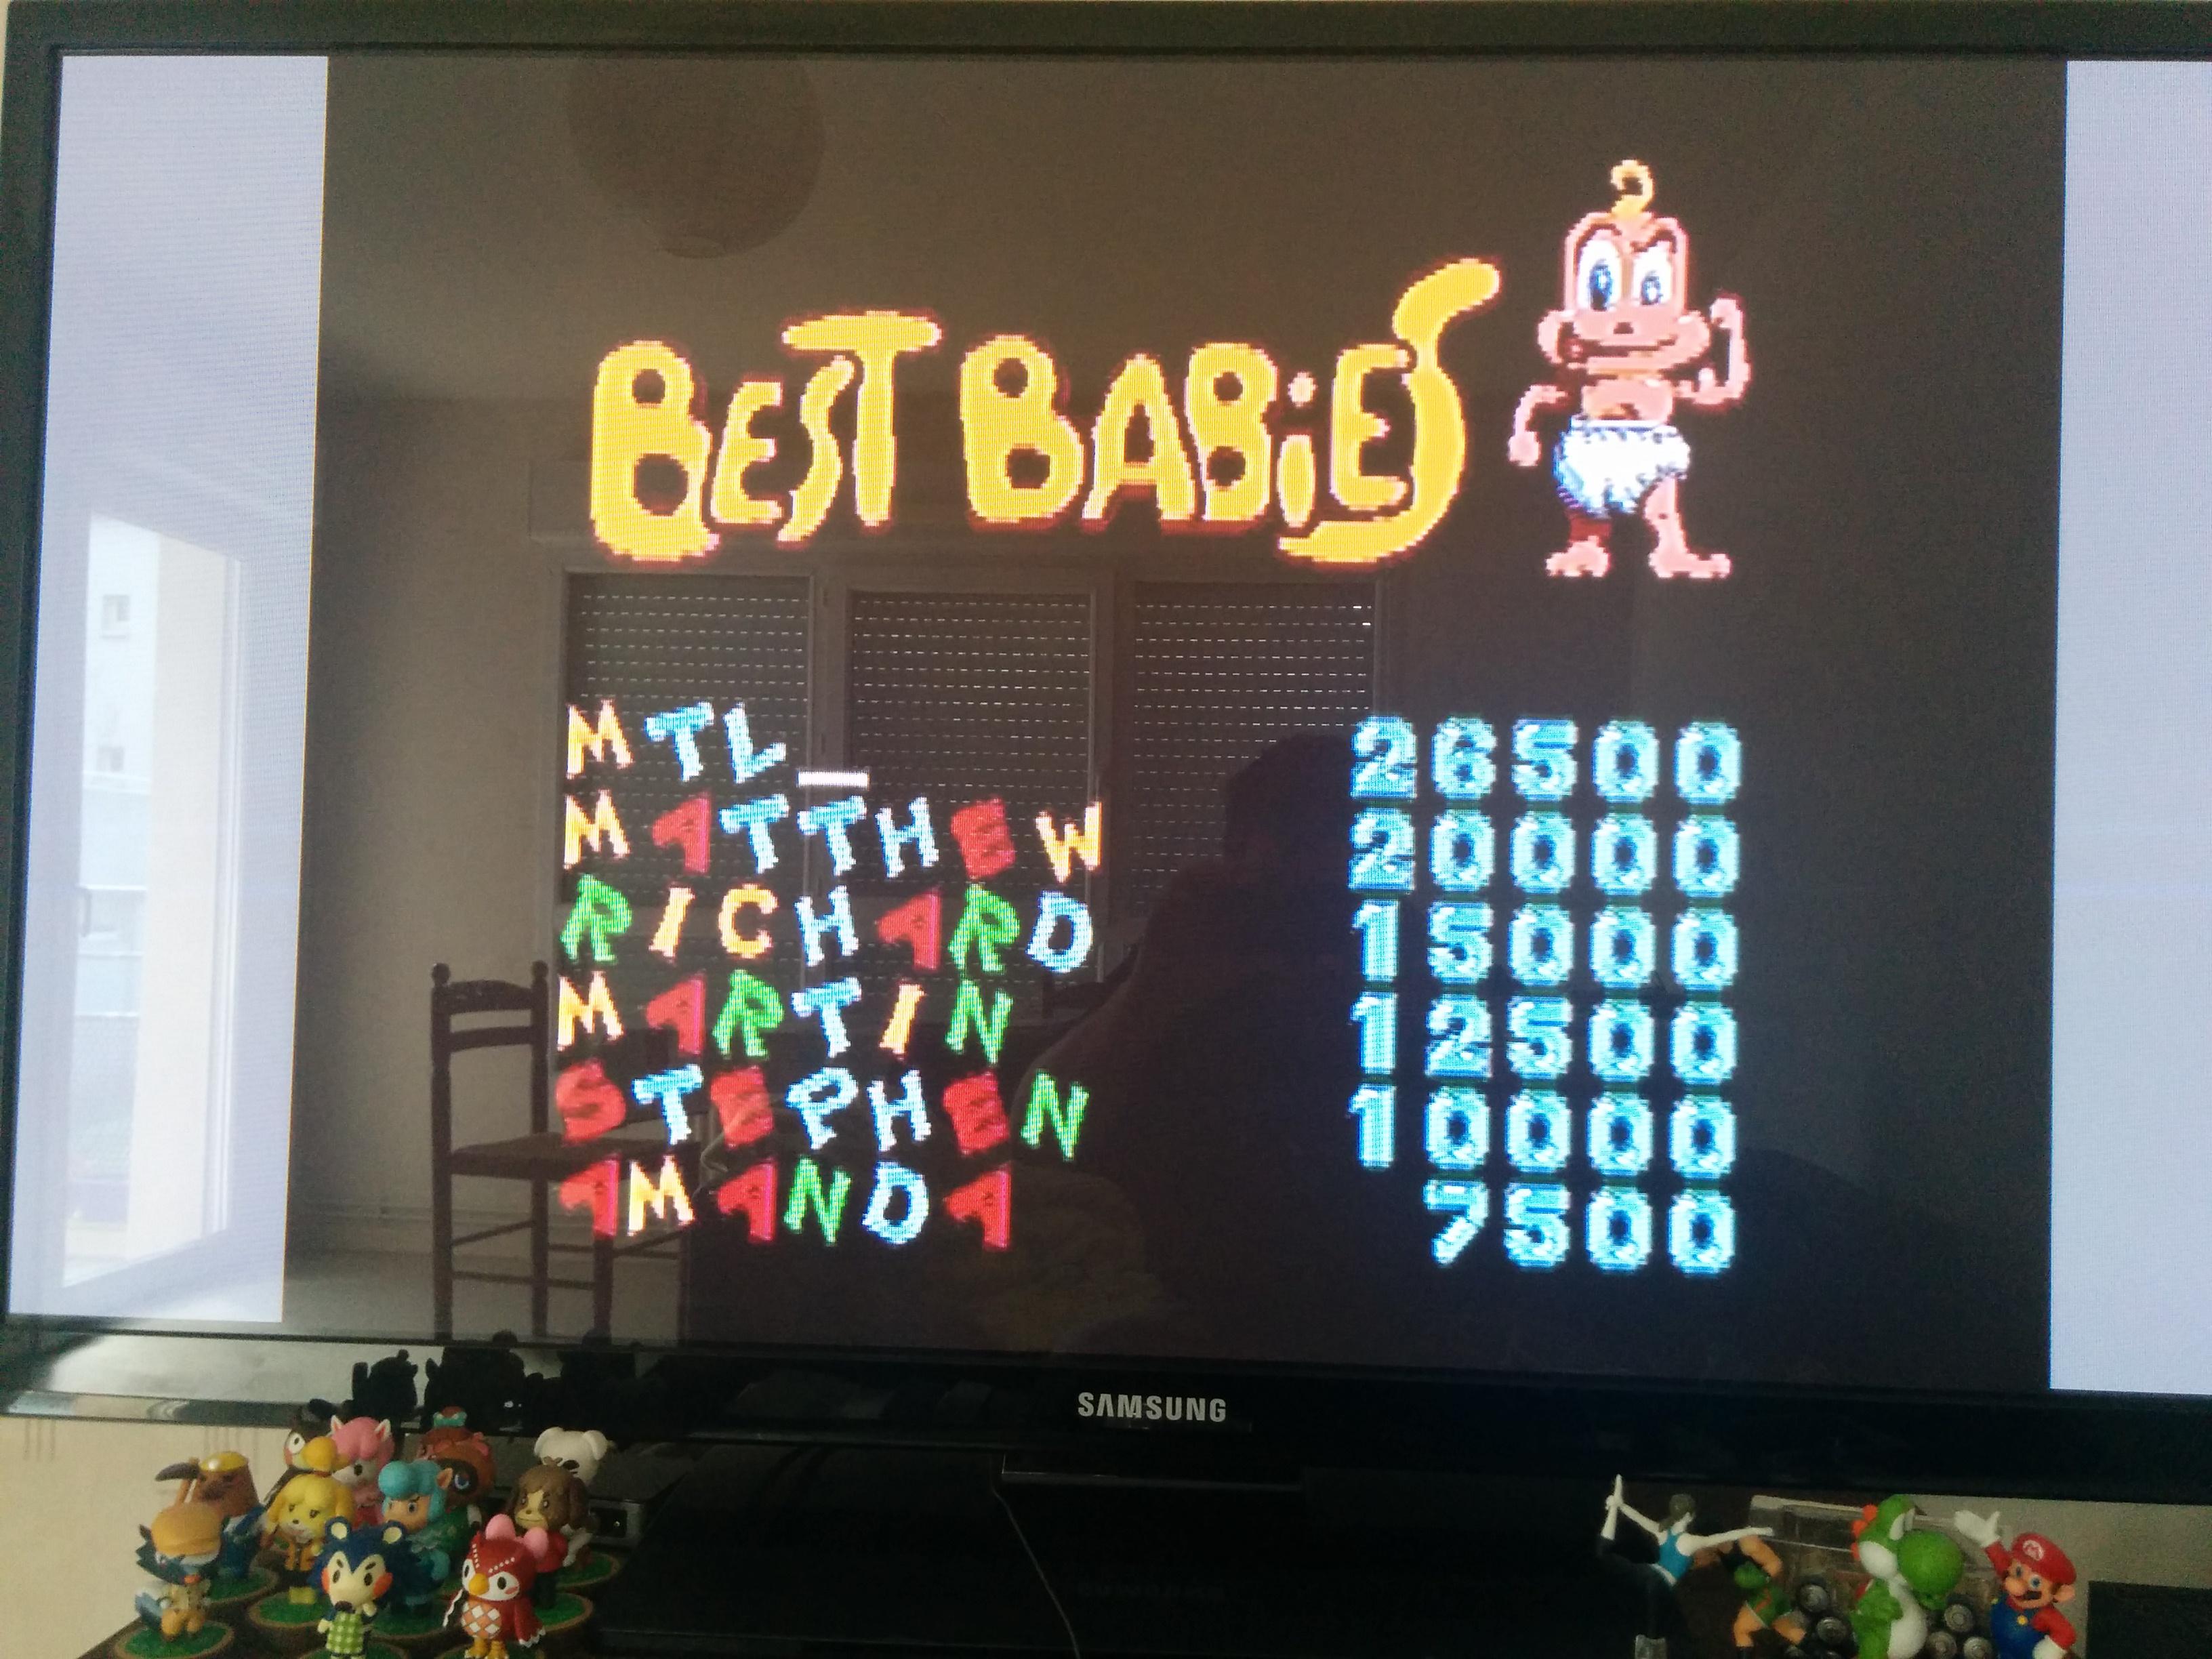 Mantalow: Baby Jo the Superhero (TurboGrafx-16/PC Engine) 26,500 points on 2016-02-08 08:17:30